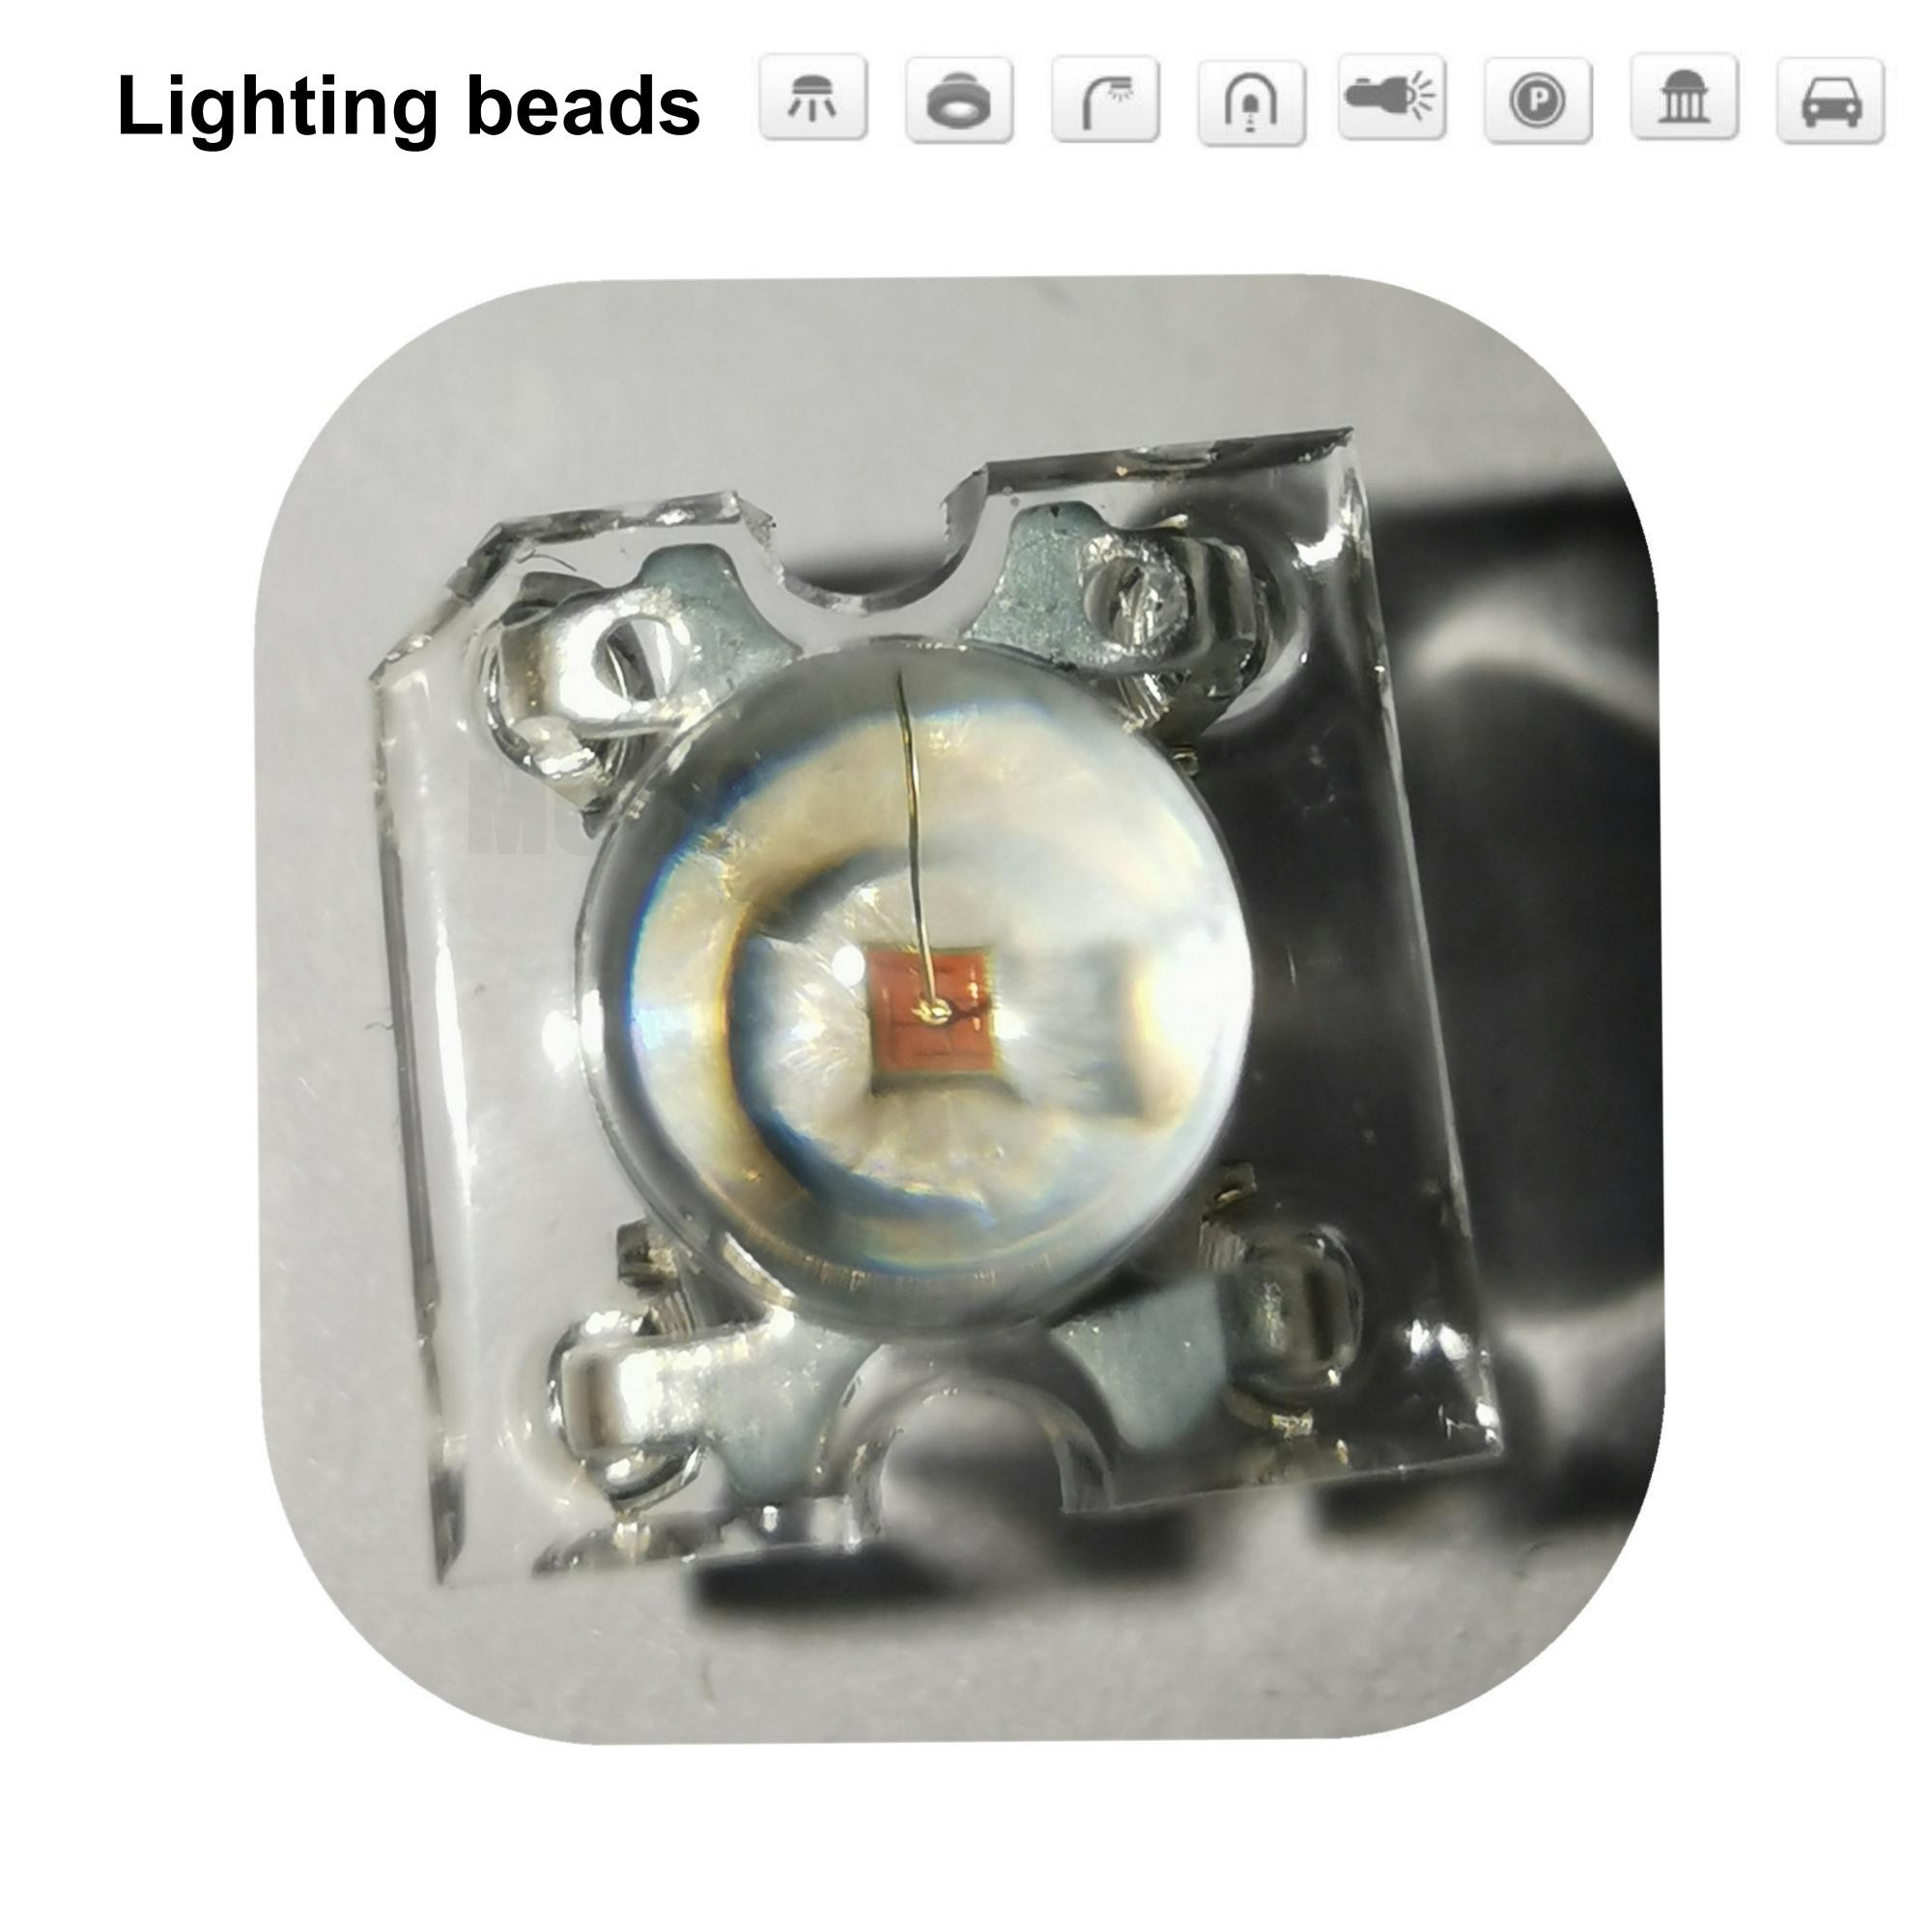 50pcs 5mm Piranha LED Diode Red Light Emitting Diodes Piranha LEDs 5 Mm Brightness Red Piranha F5 Lamp Bead Diodo Lampada